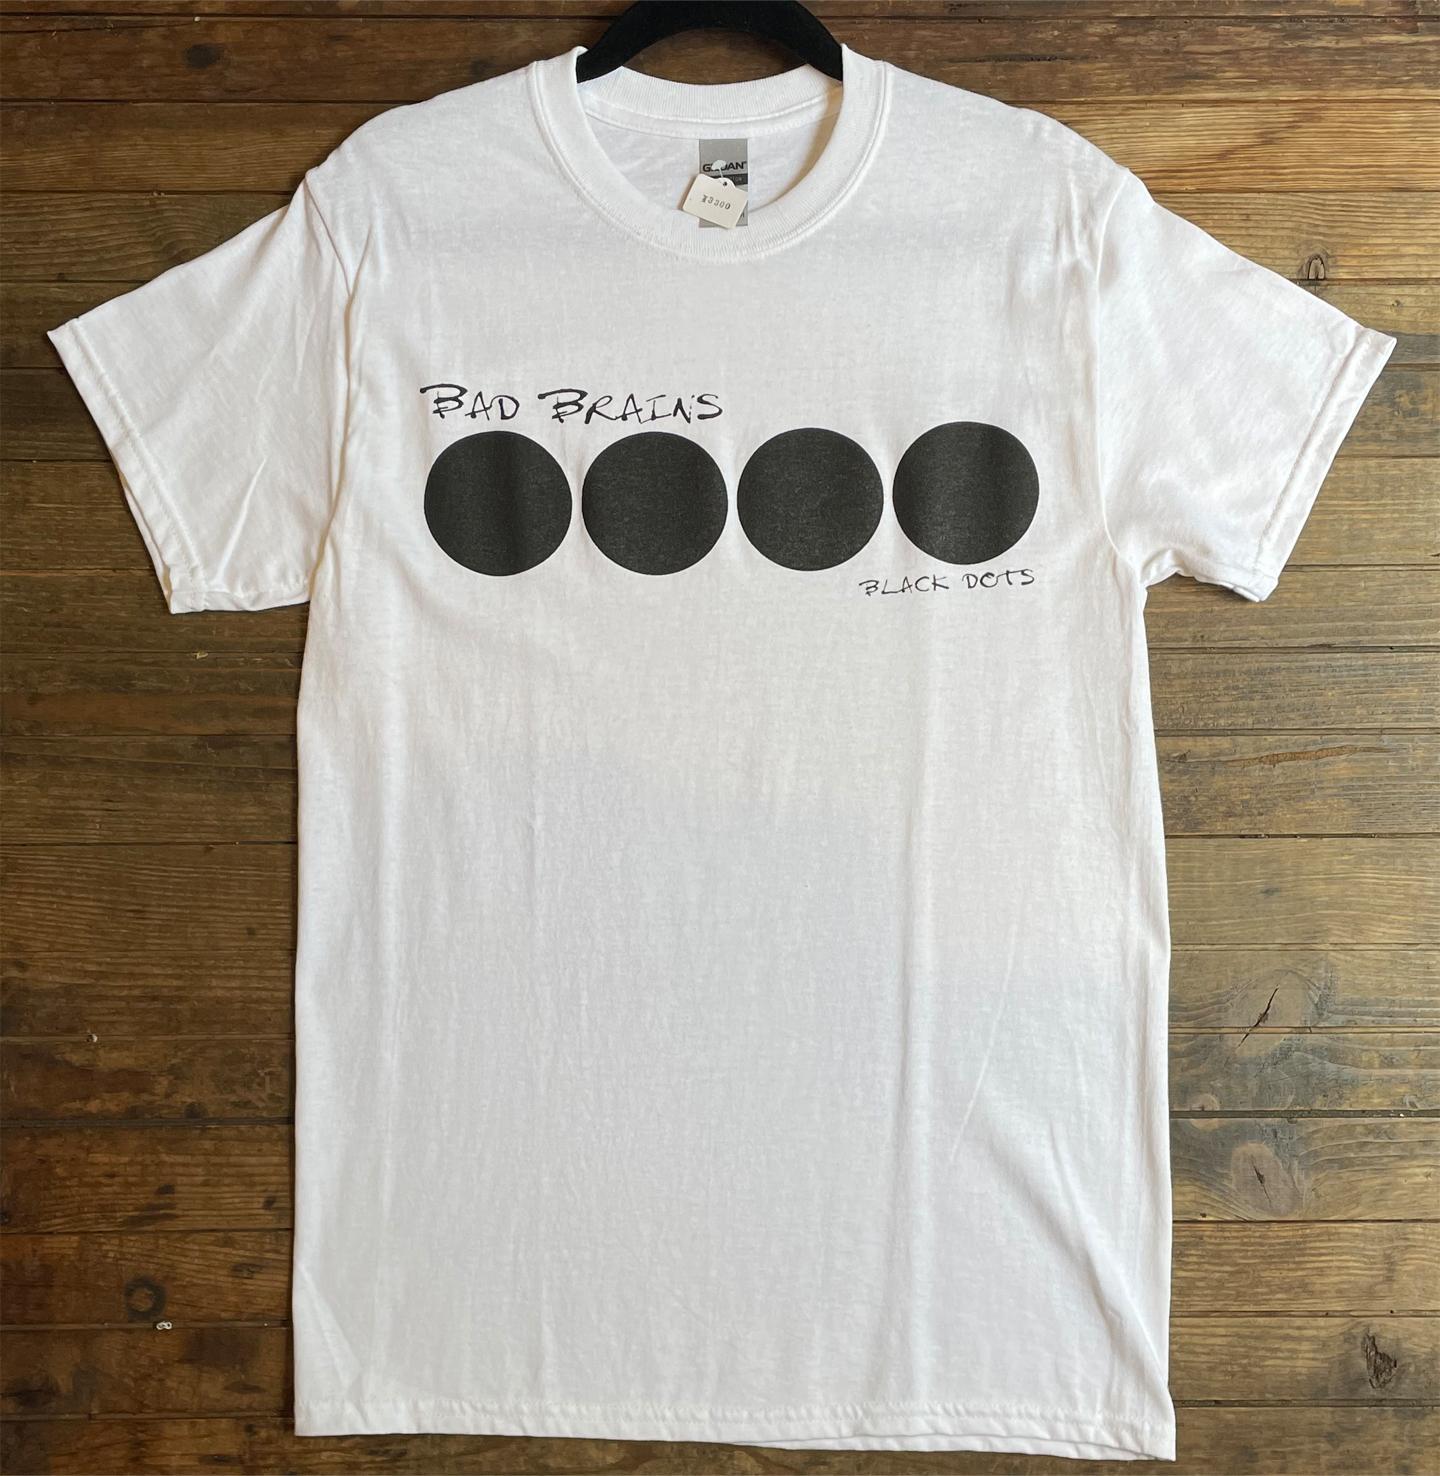 BAD BRAINS Tシャツ BLACK DOTS2